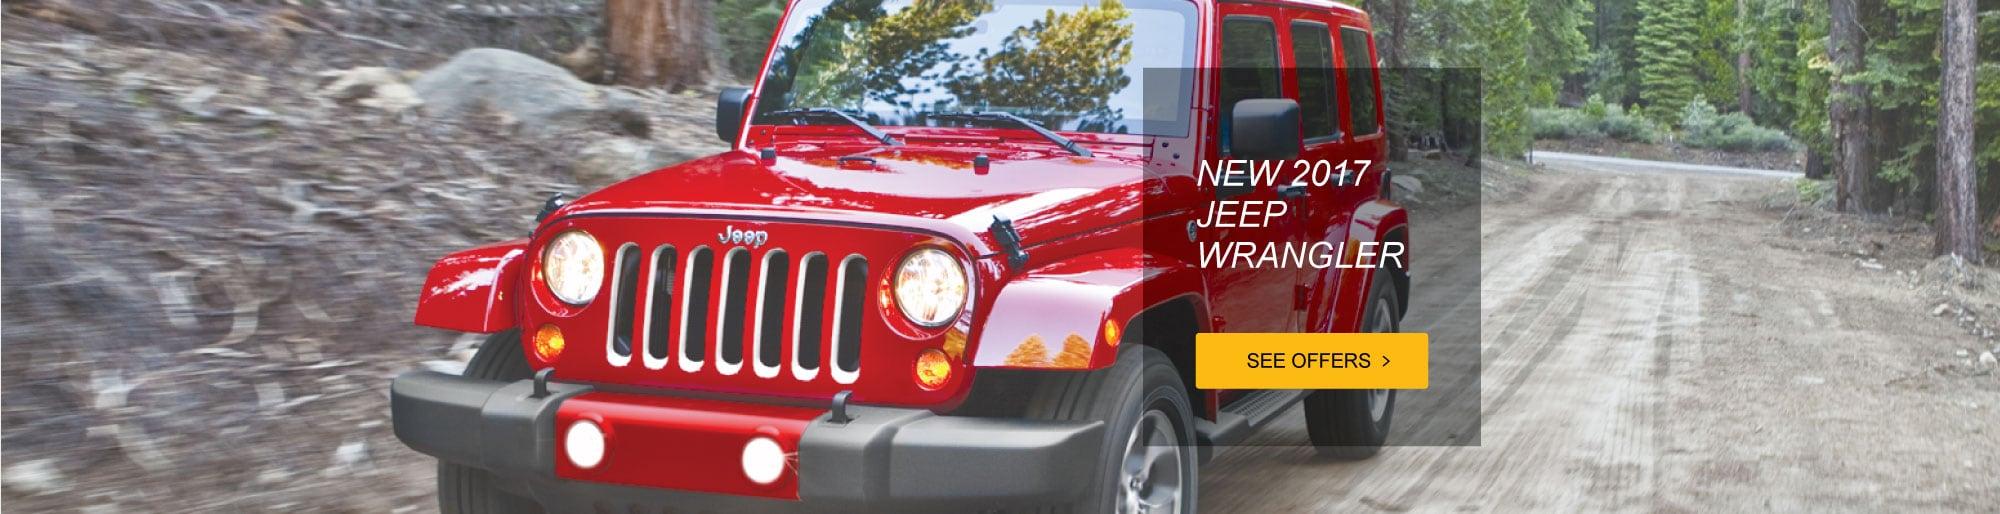 Car Dealerships In Albuquerque Nm >> Lithia Chrysler Dodge Jeep Ram Fiat of Santa Fe   New ...